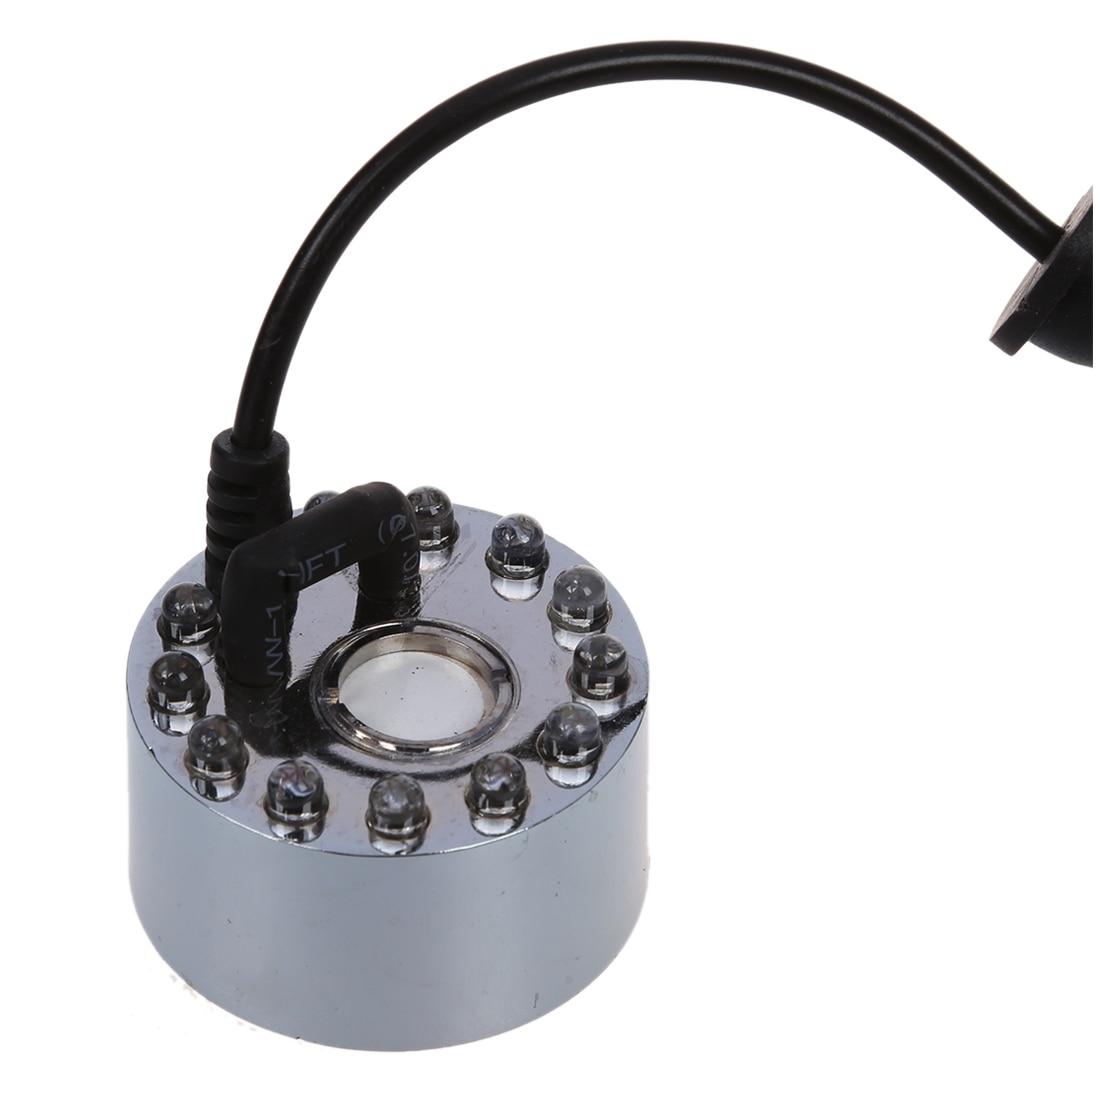 где купить Ultrasonic Mist Fountain Maker Fogger Water Fountain Mist Diffuser Humidifier Pond 12 LED Changing Night Light For Party по лучшей цене